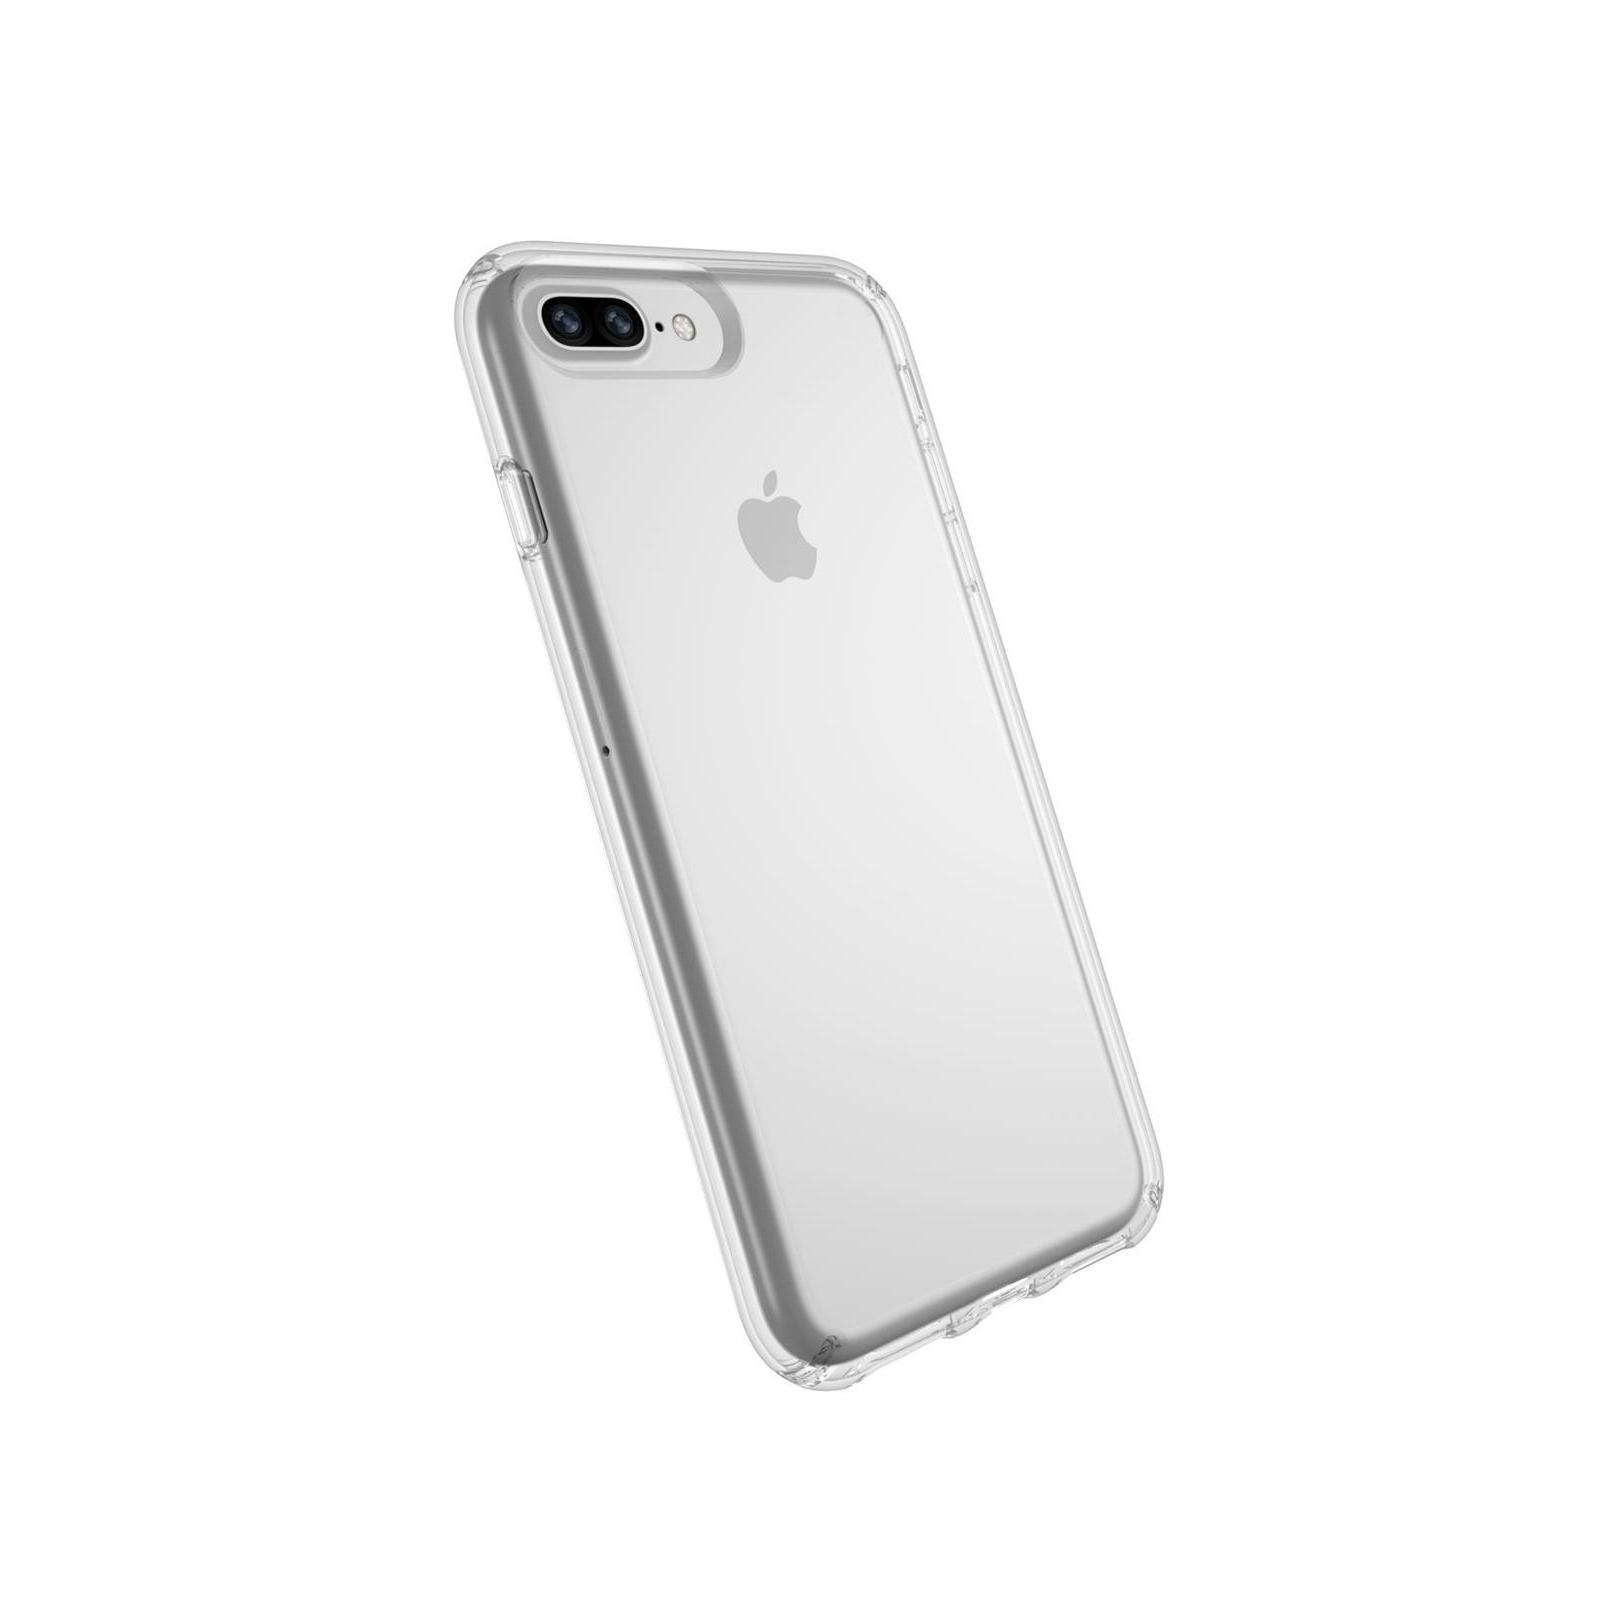 Чехол для моб. телефона Laudtec для iPhone 7/8 Plus Clear tpu (Transperent) (LC-IP78PST) изображение 3